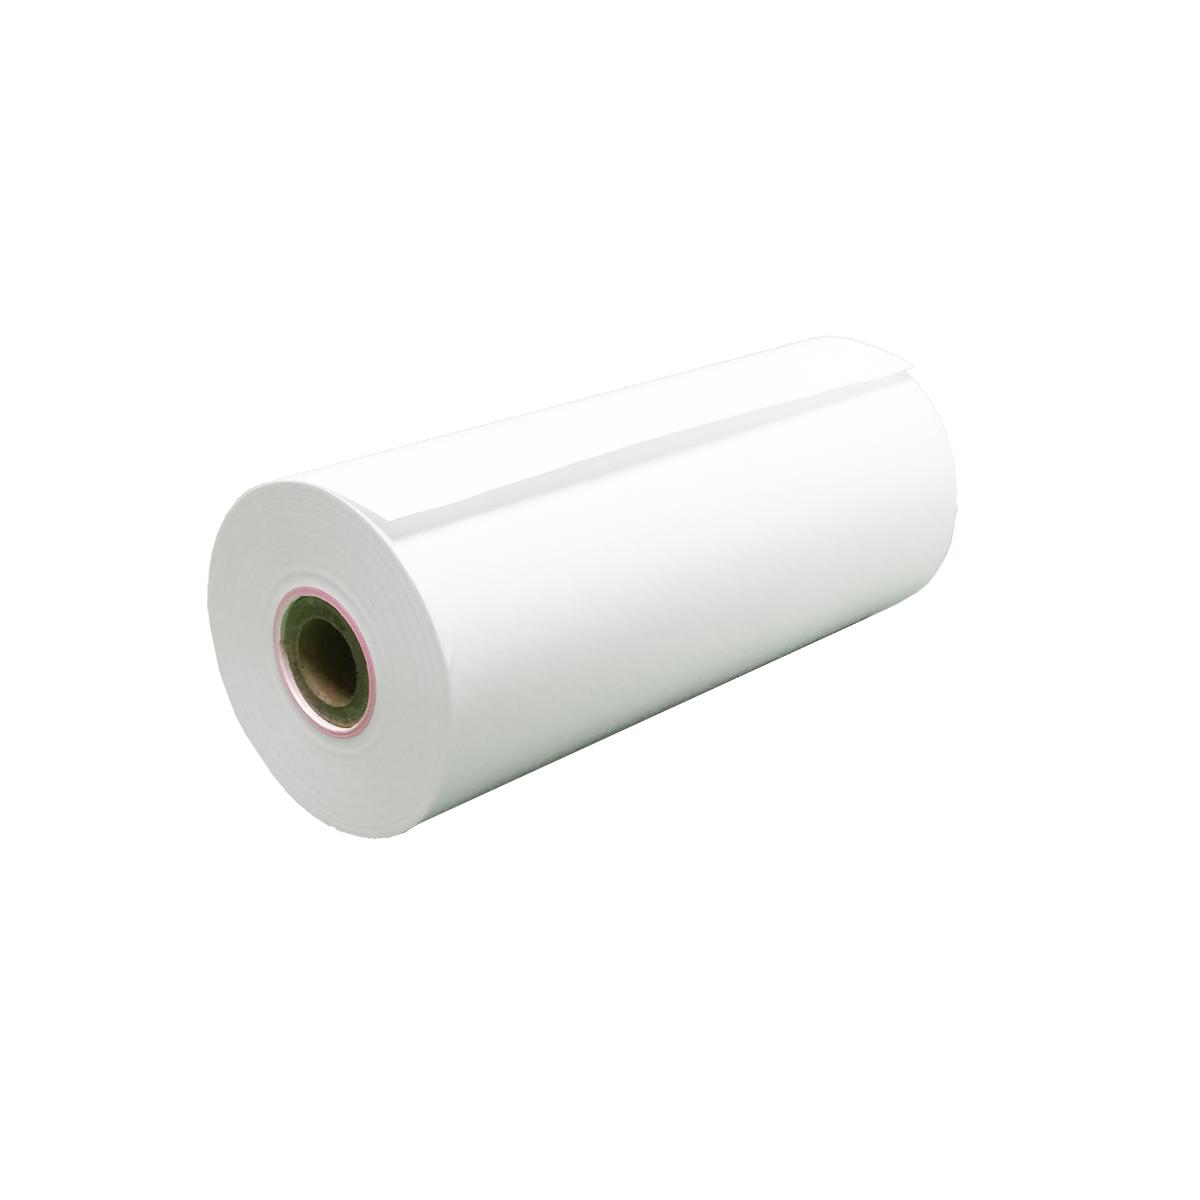 SANEI 三栄電機 SM2-41 対応汎用 感熱レジロール紙 (50巻パック)